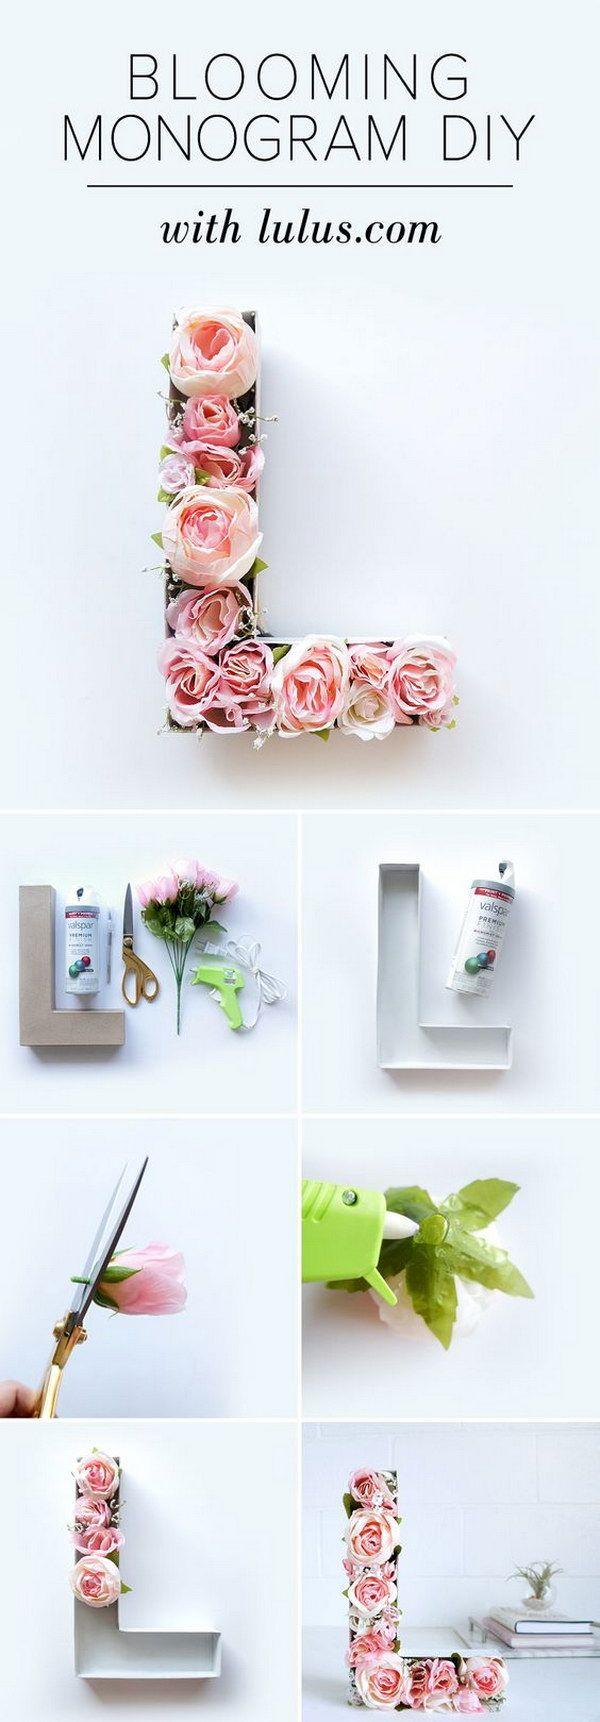 DIY Blooming Monogram